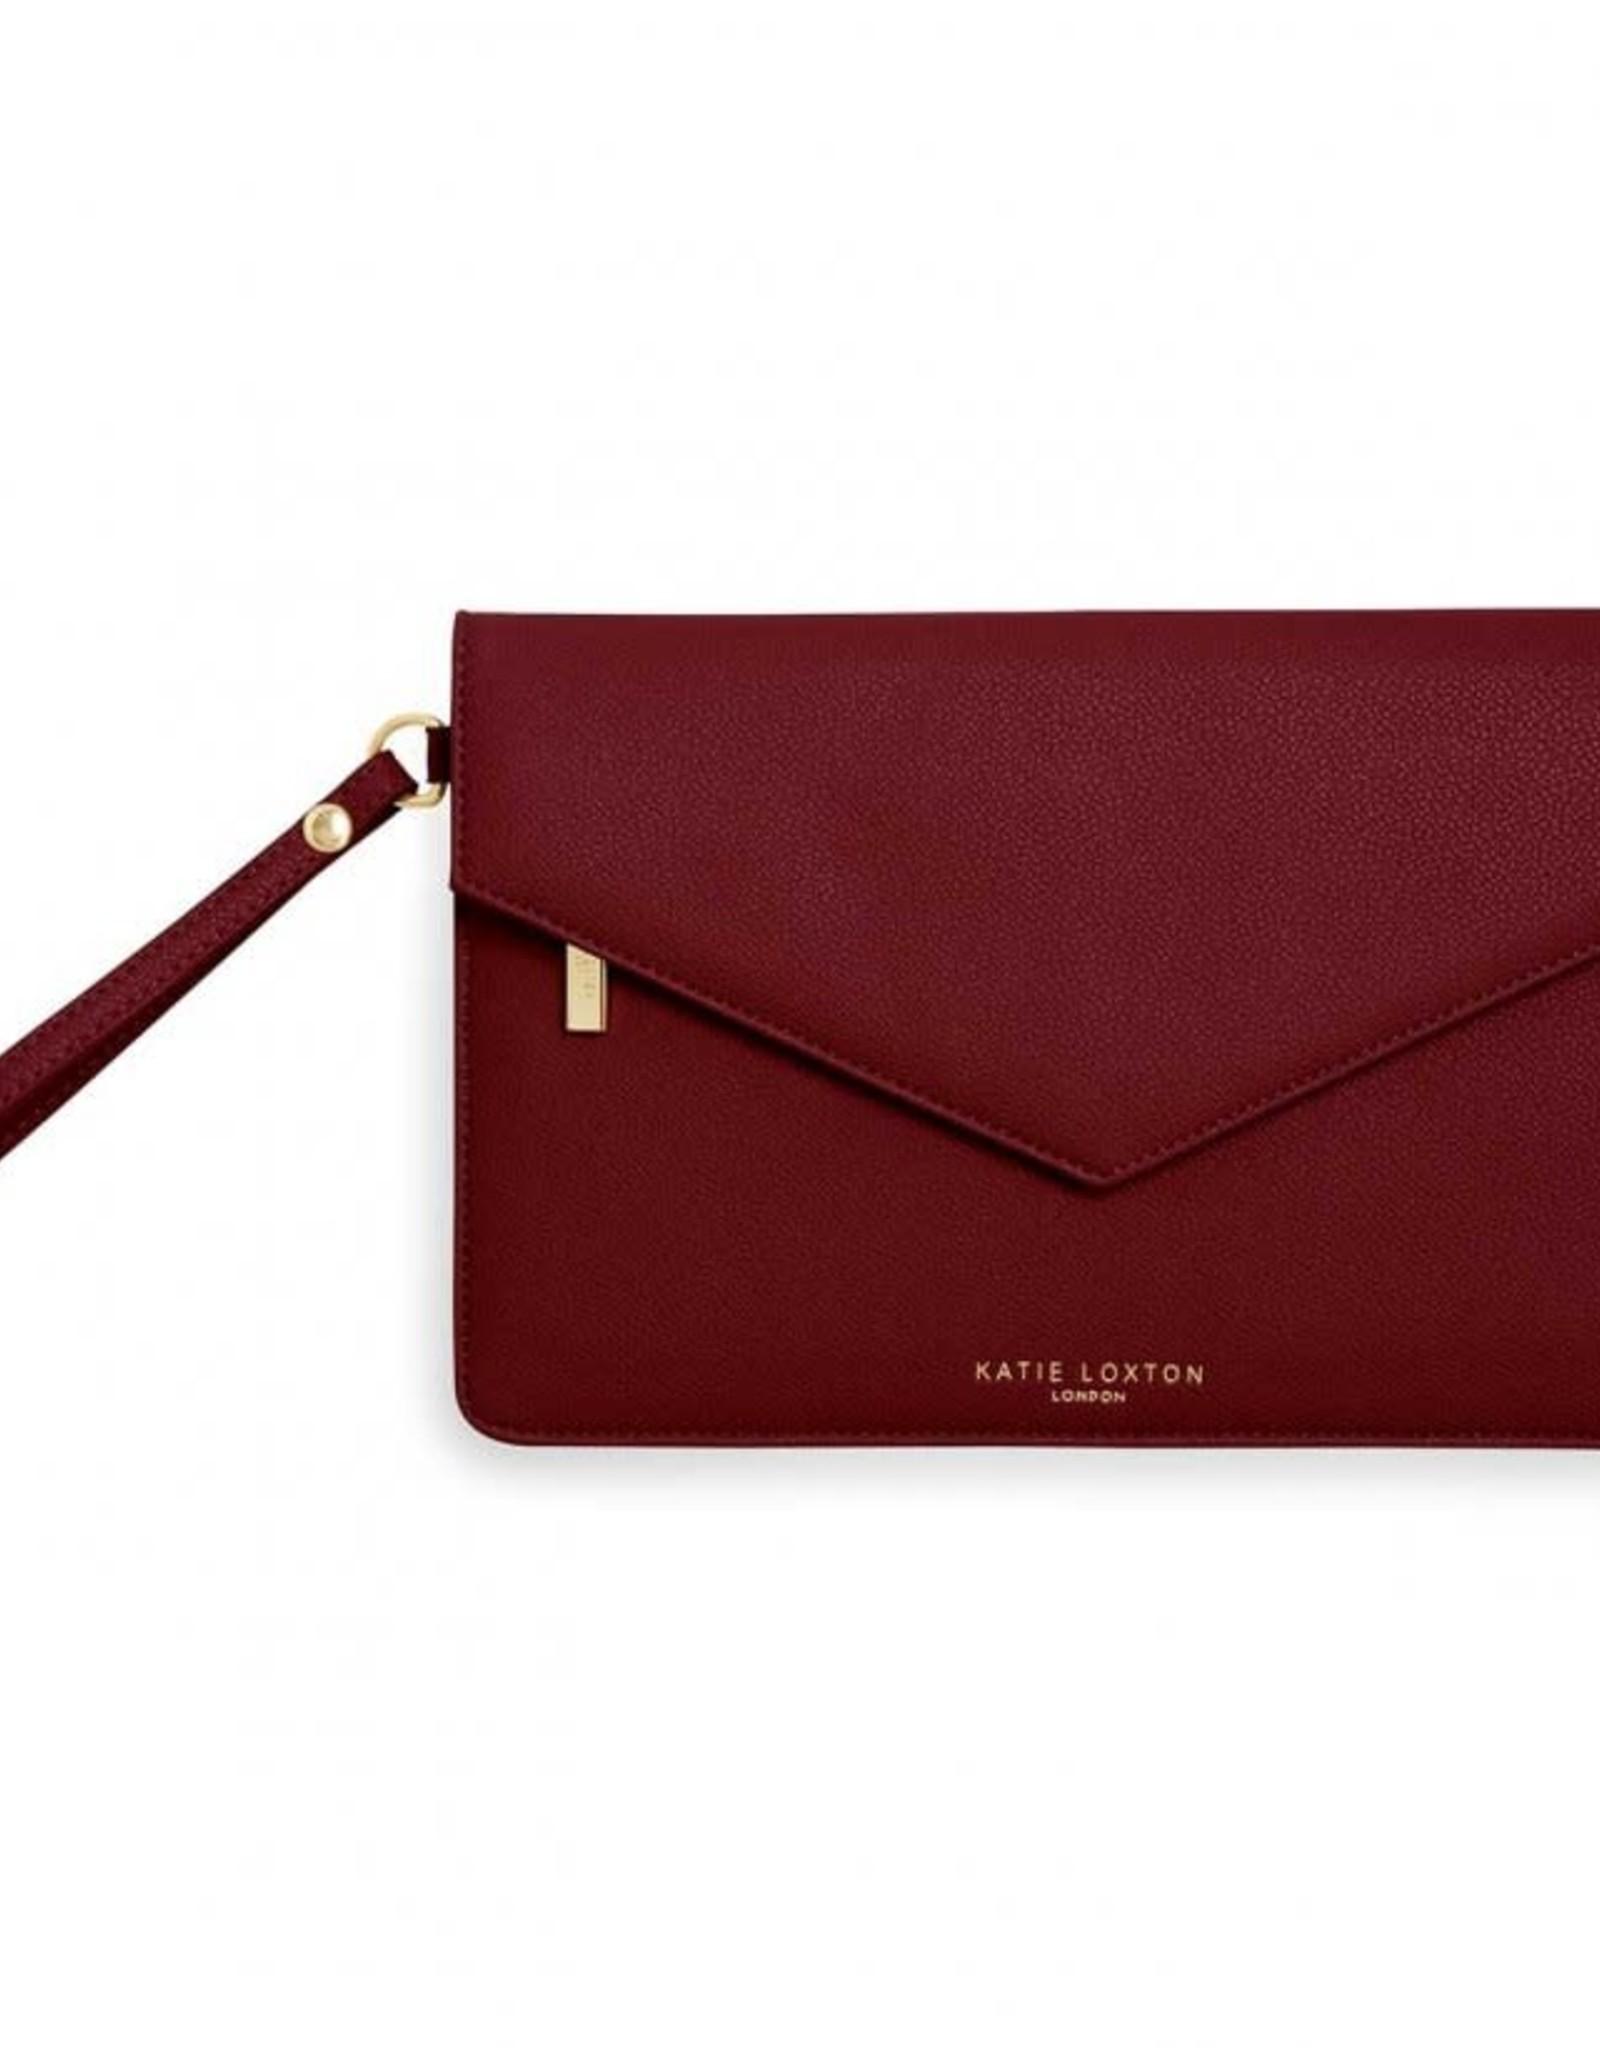 Katie Loxton Esme Envelope Clutch Follow Your Heart Burgundy